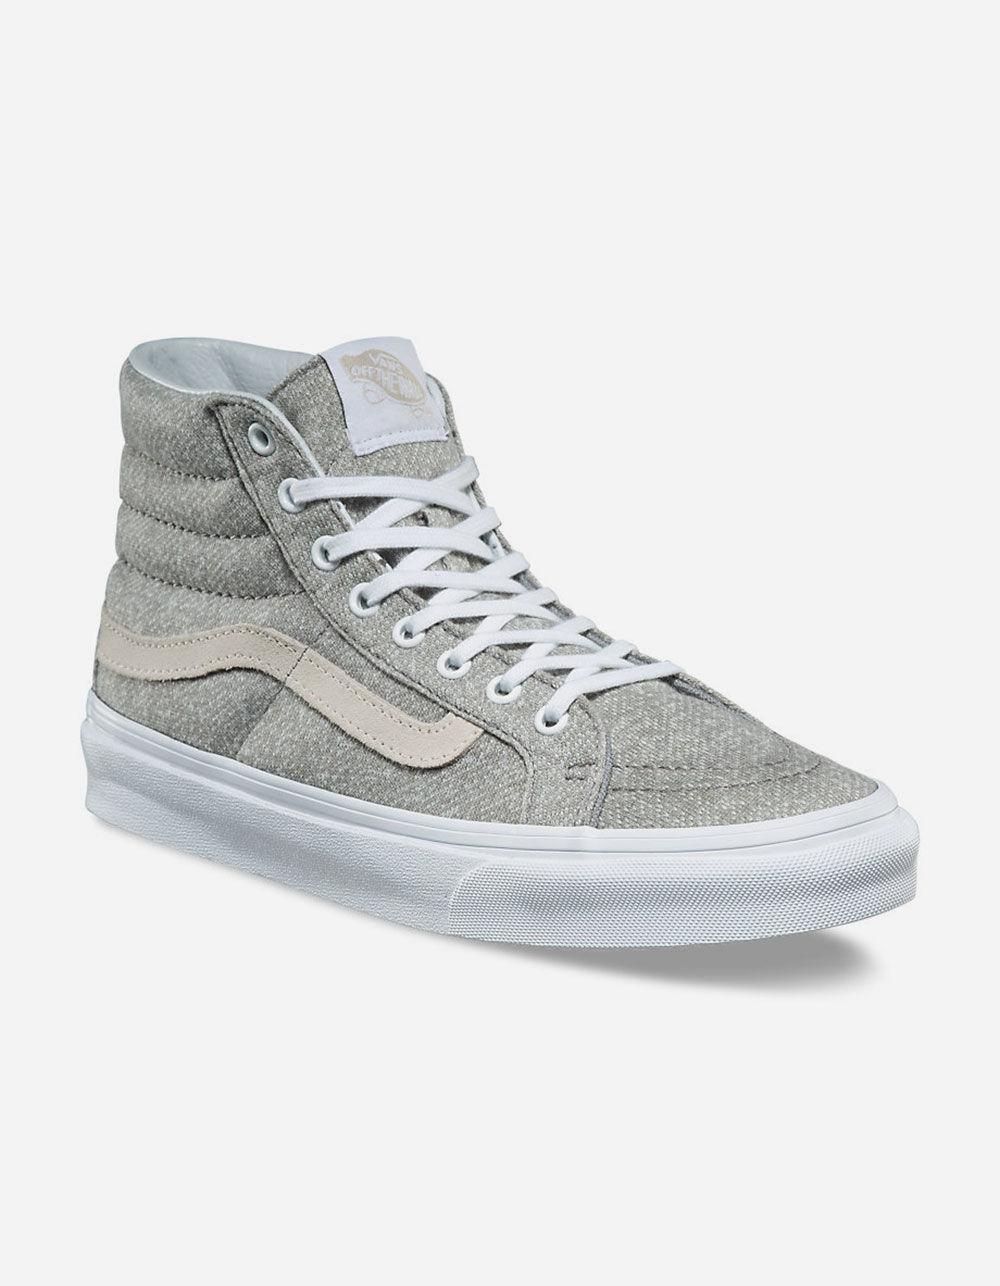 a39a8415ed06c Lyst - Vans J s Sk8-hi Slim Womens Shoes in Gray